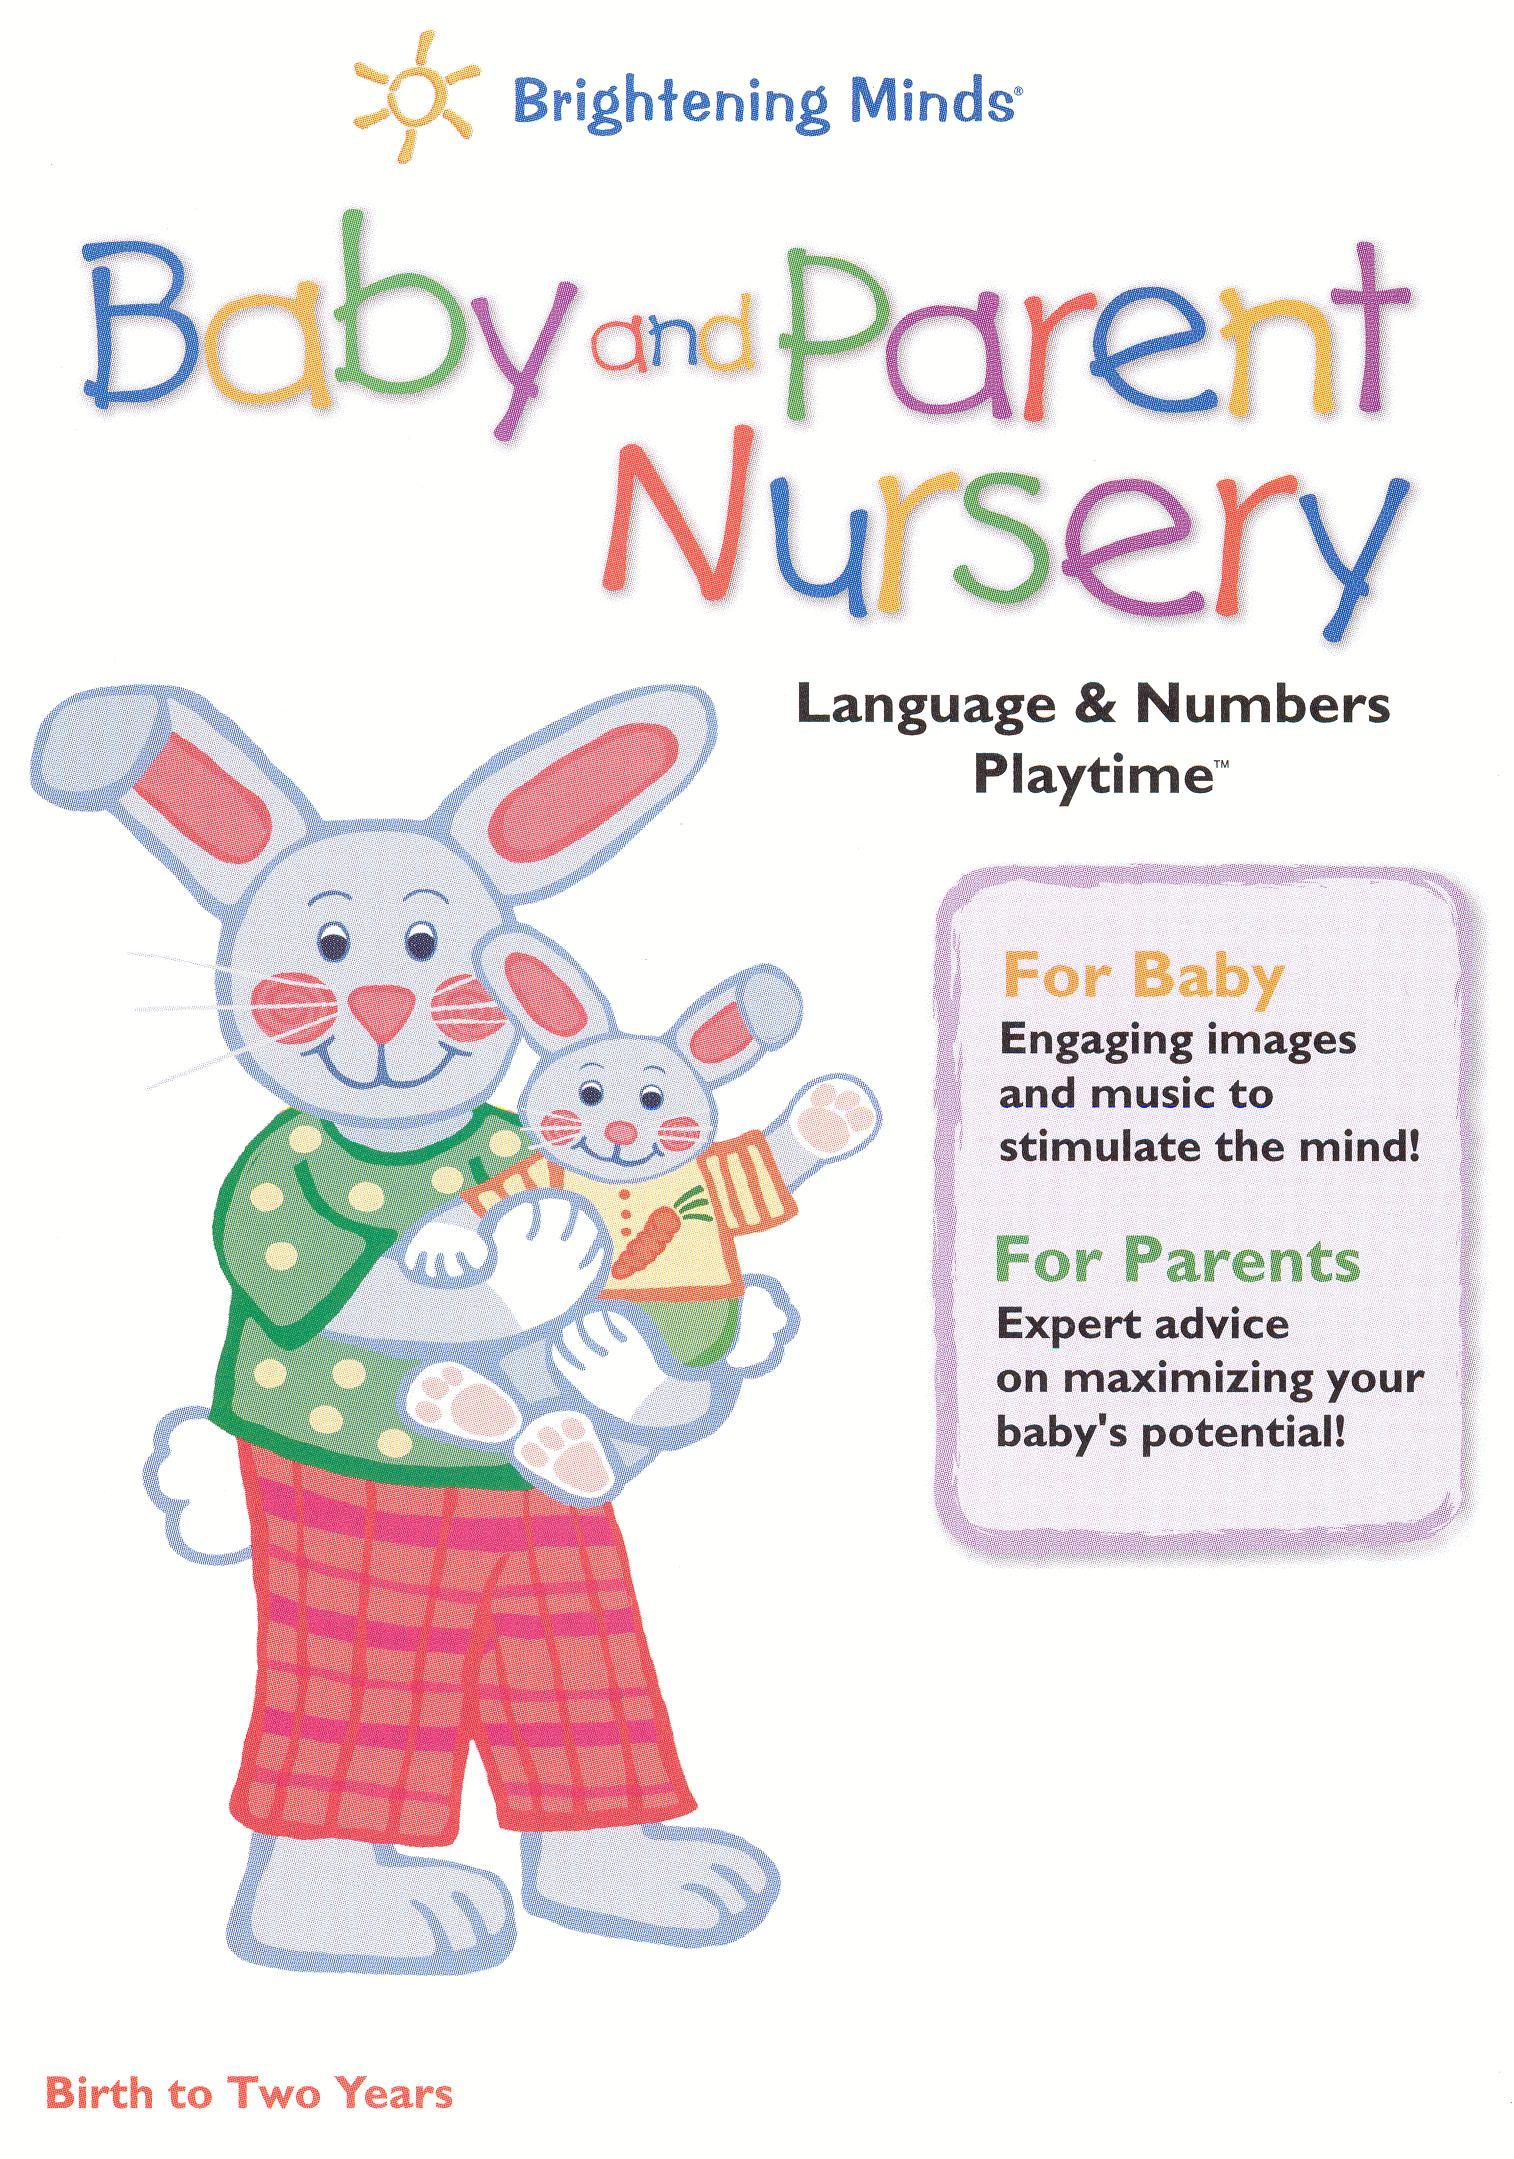 Baby and Parent Nursery: Language